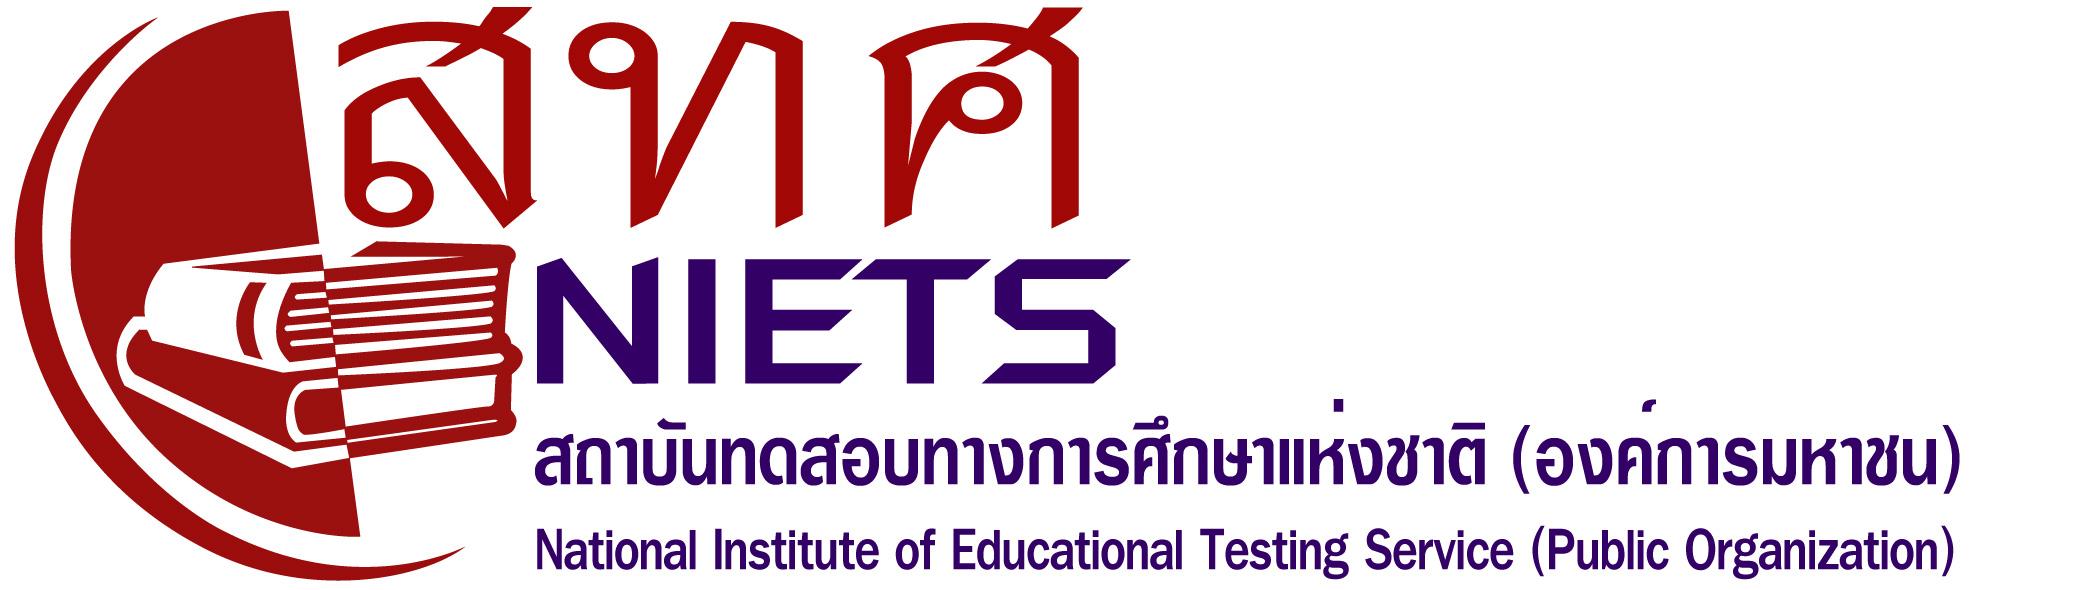 logo1_12